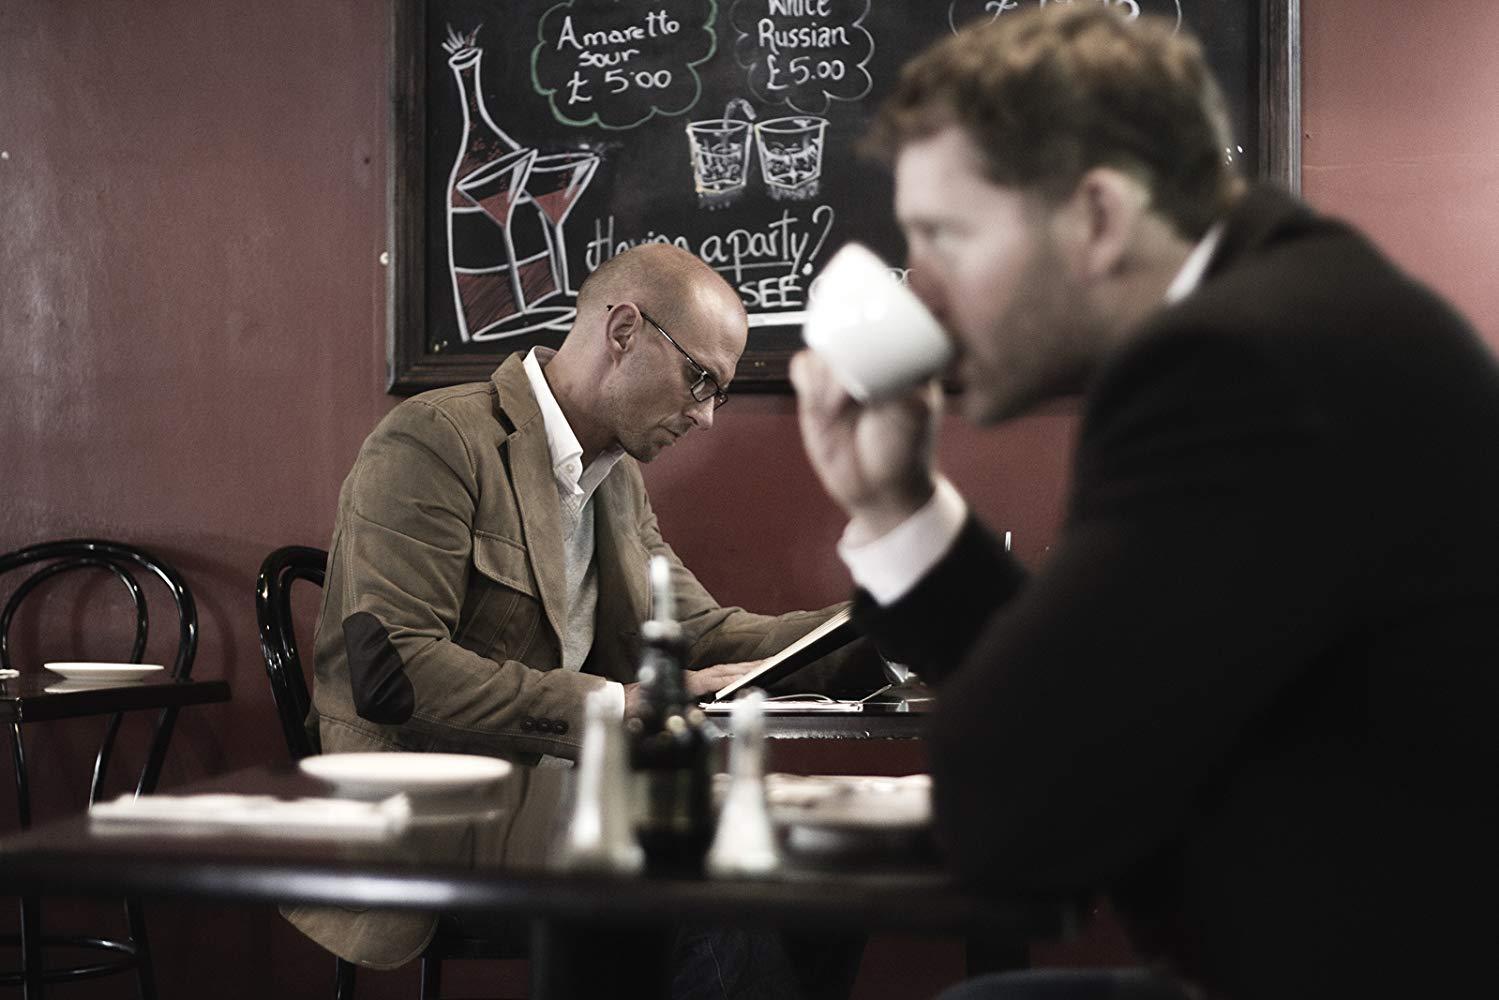 مشاهدة فيلم Interview With A Hitman 2012 HD مترجم كامل اون لاين